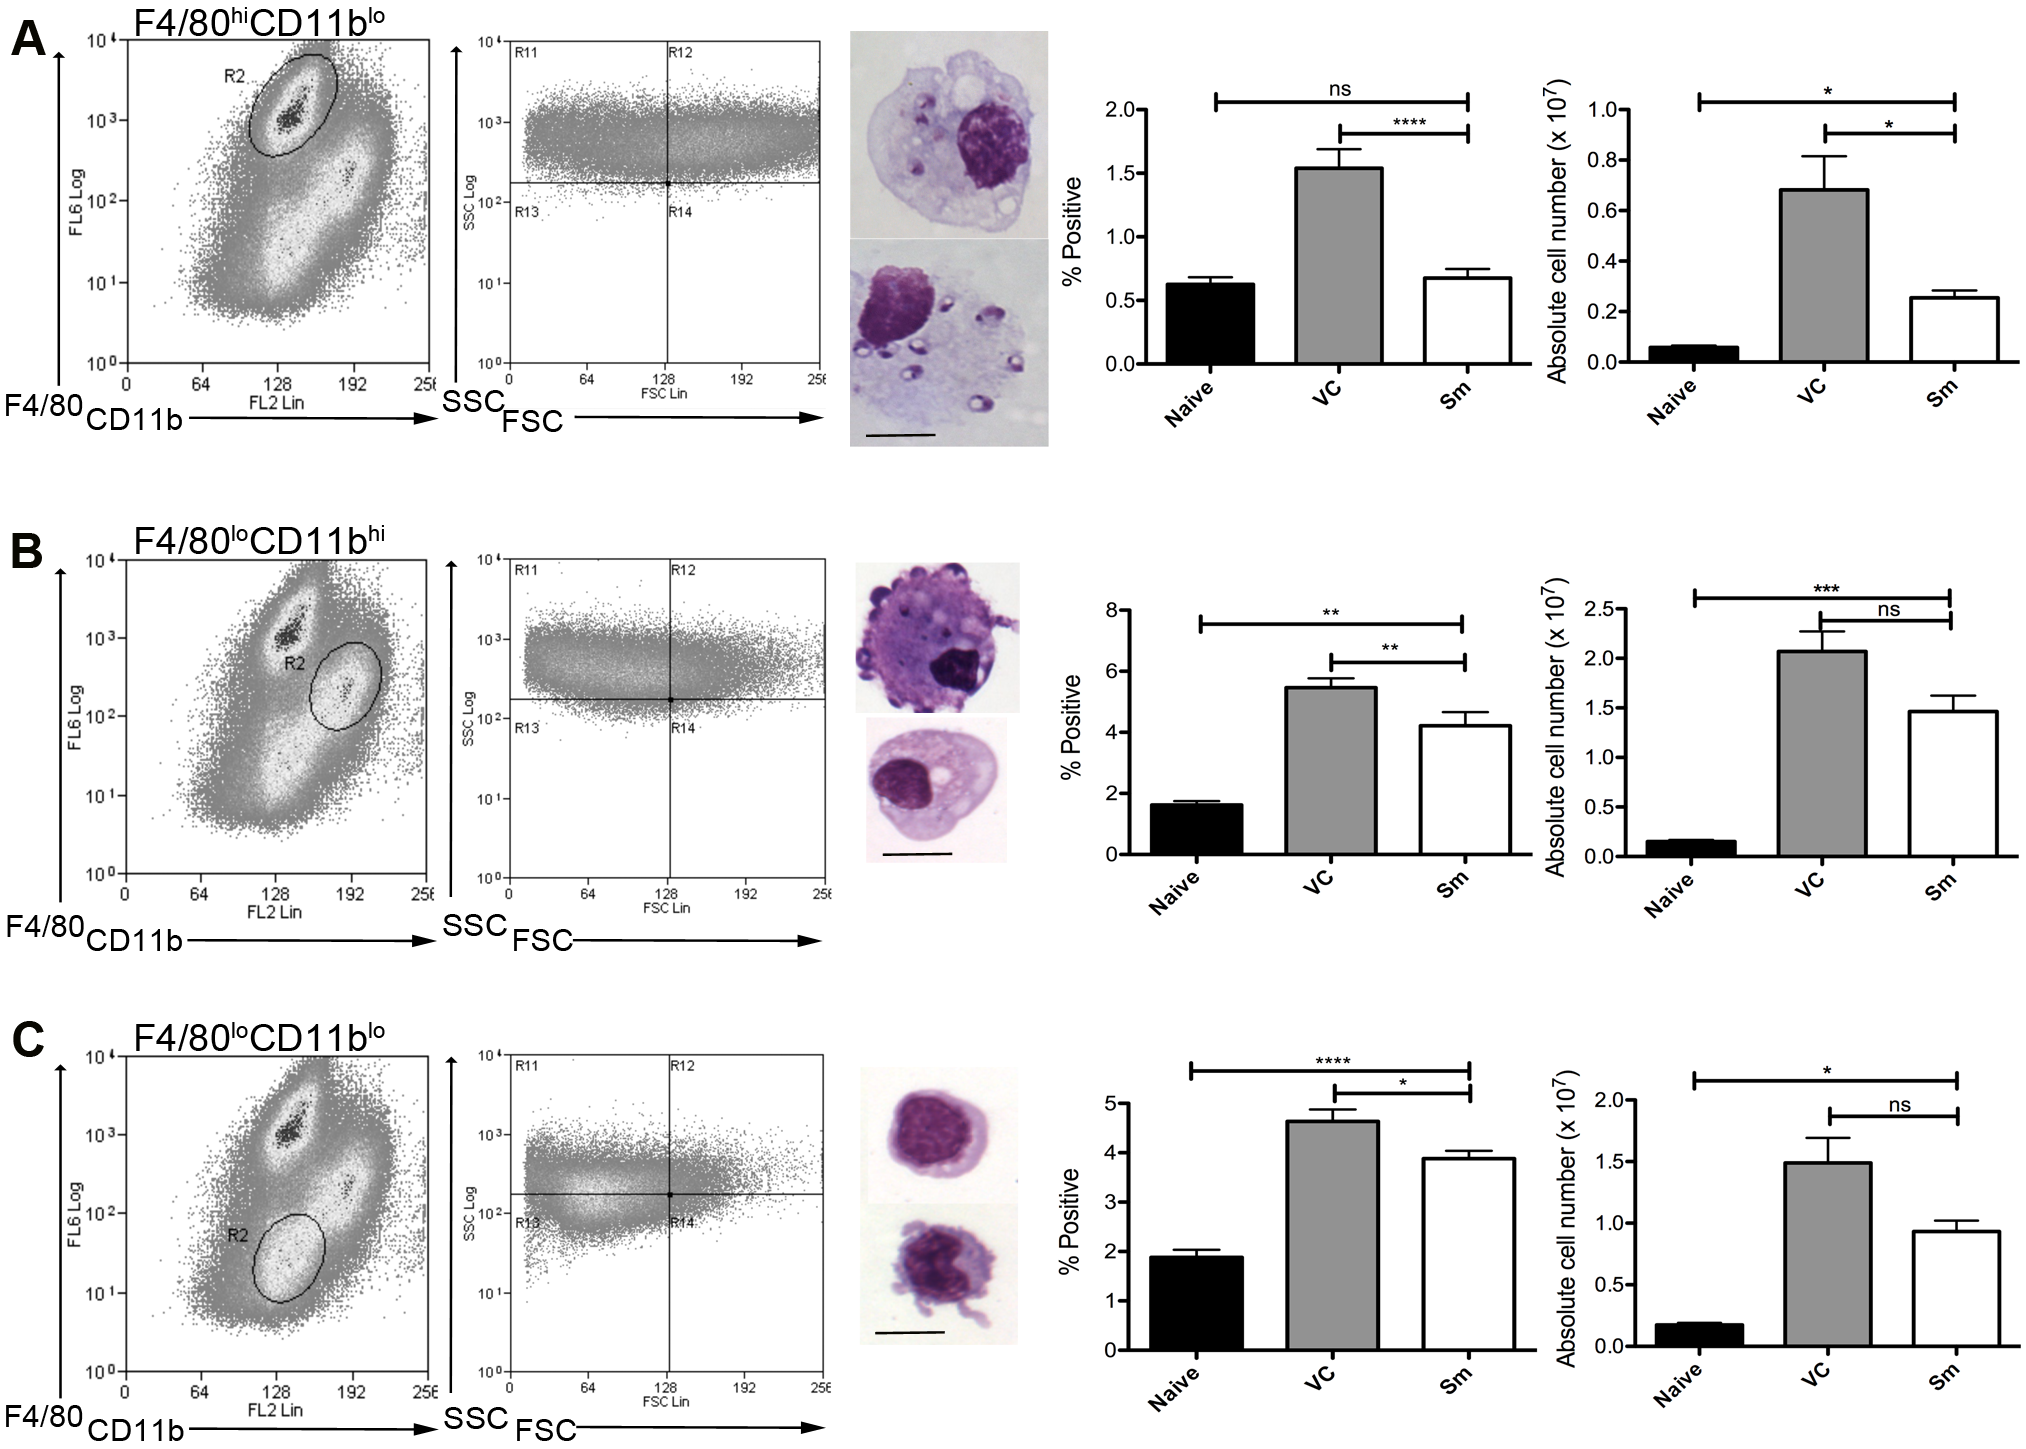 Sensitivity of mononuclear phagocytes in <i>L.donovani</i> infected mice to RTKi treatment.